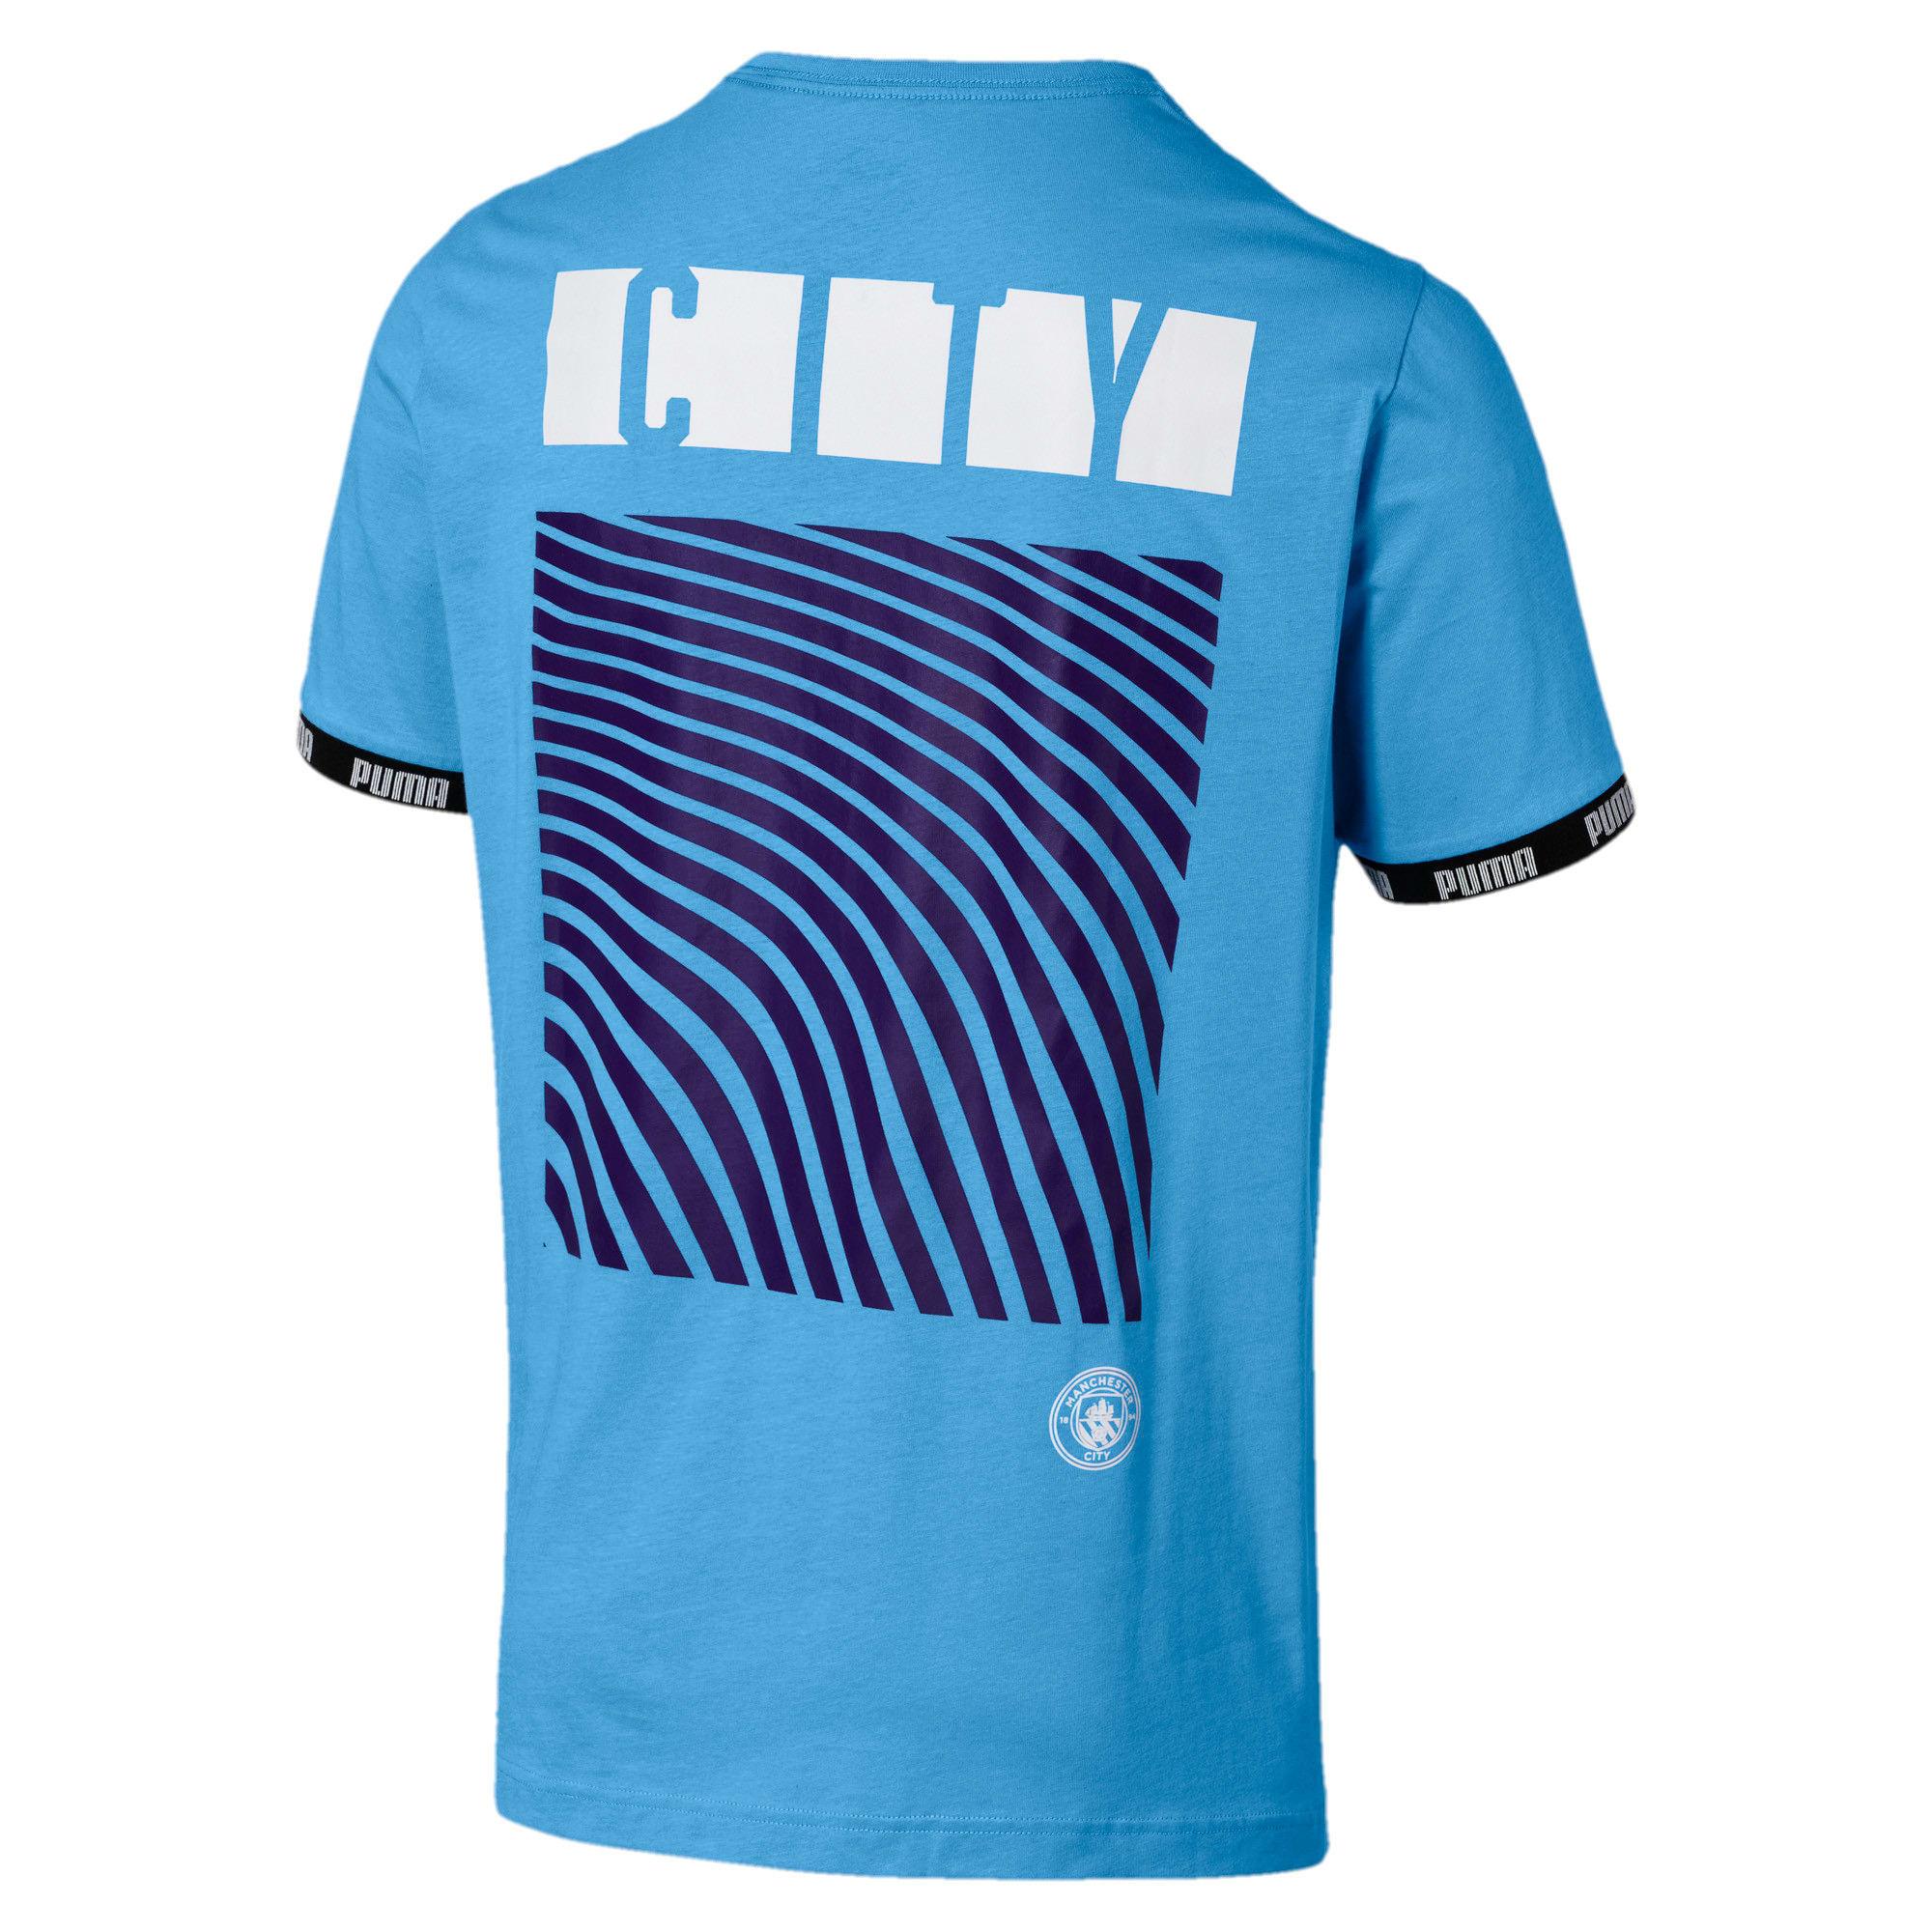 Thumbnail 5 of Manchester City FC FtblCulture Men's Tee, Team Light Blue, medium